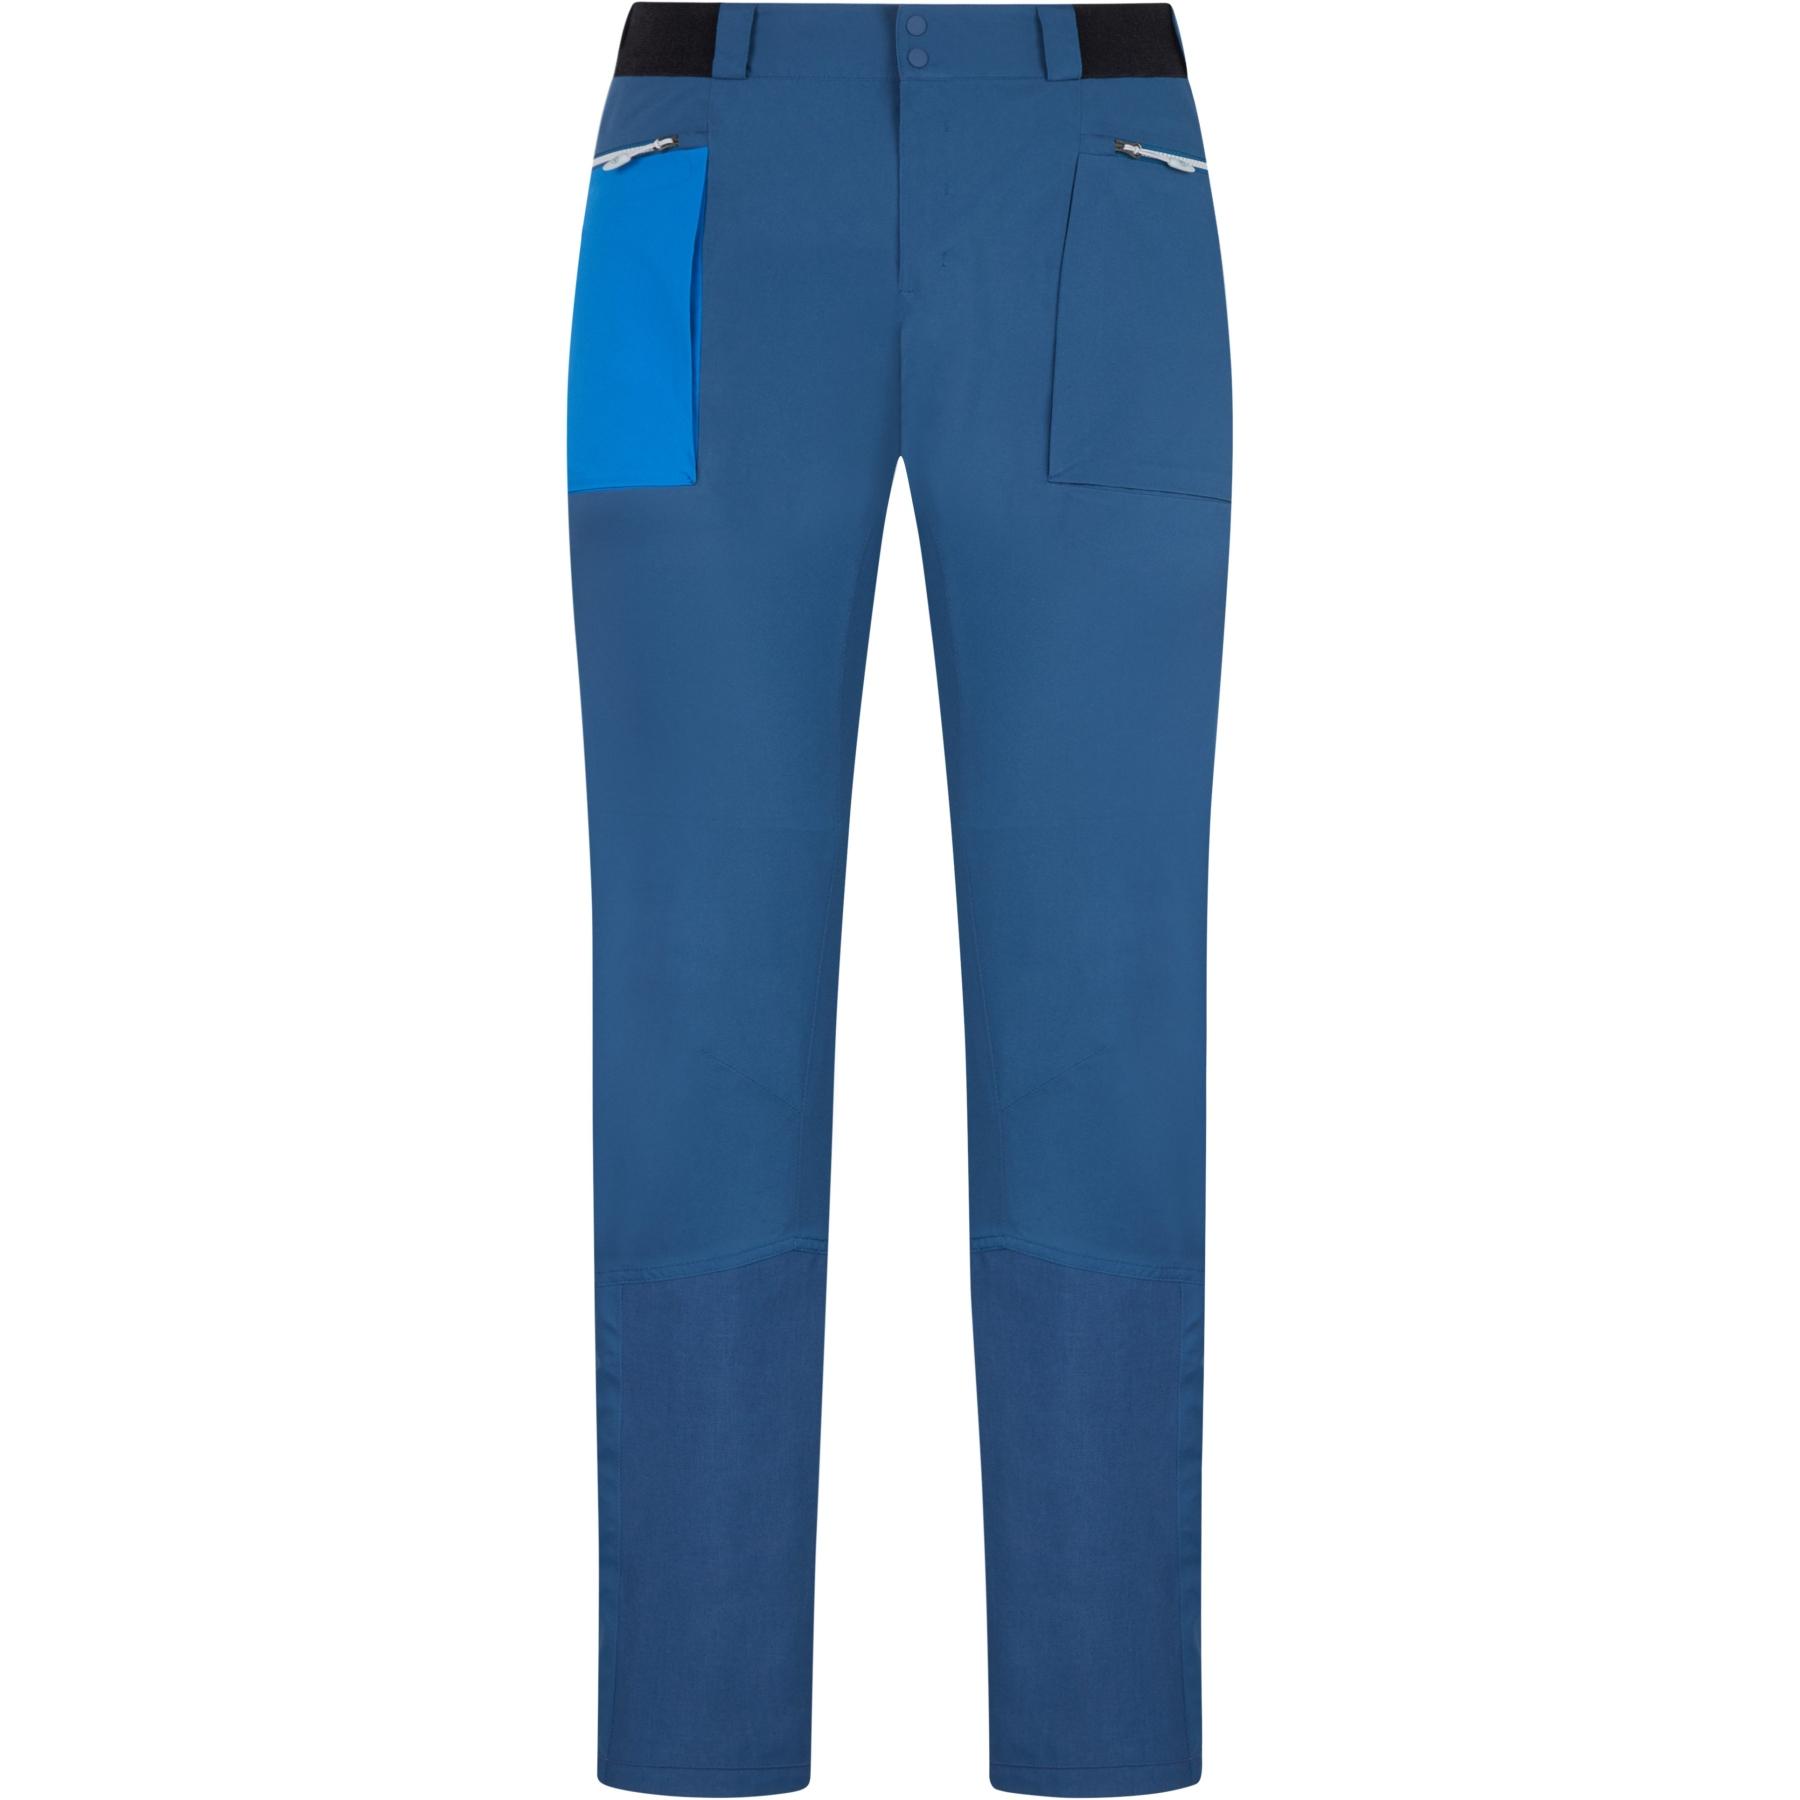 La Sportiva Crizzle Pants - Opal/Aquarius